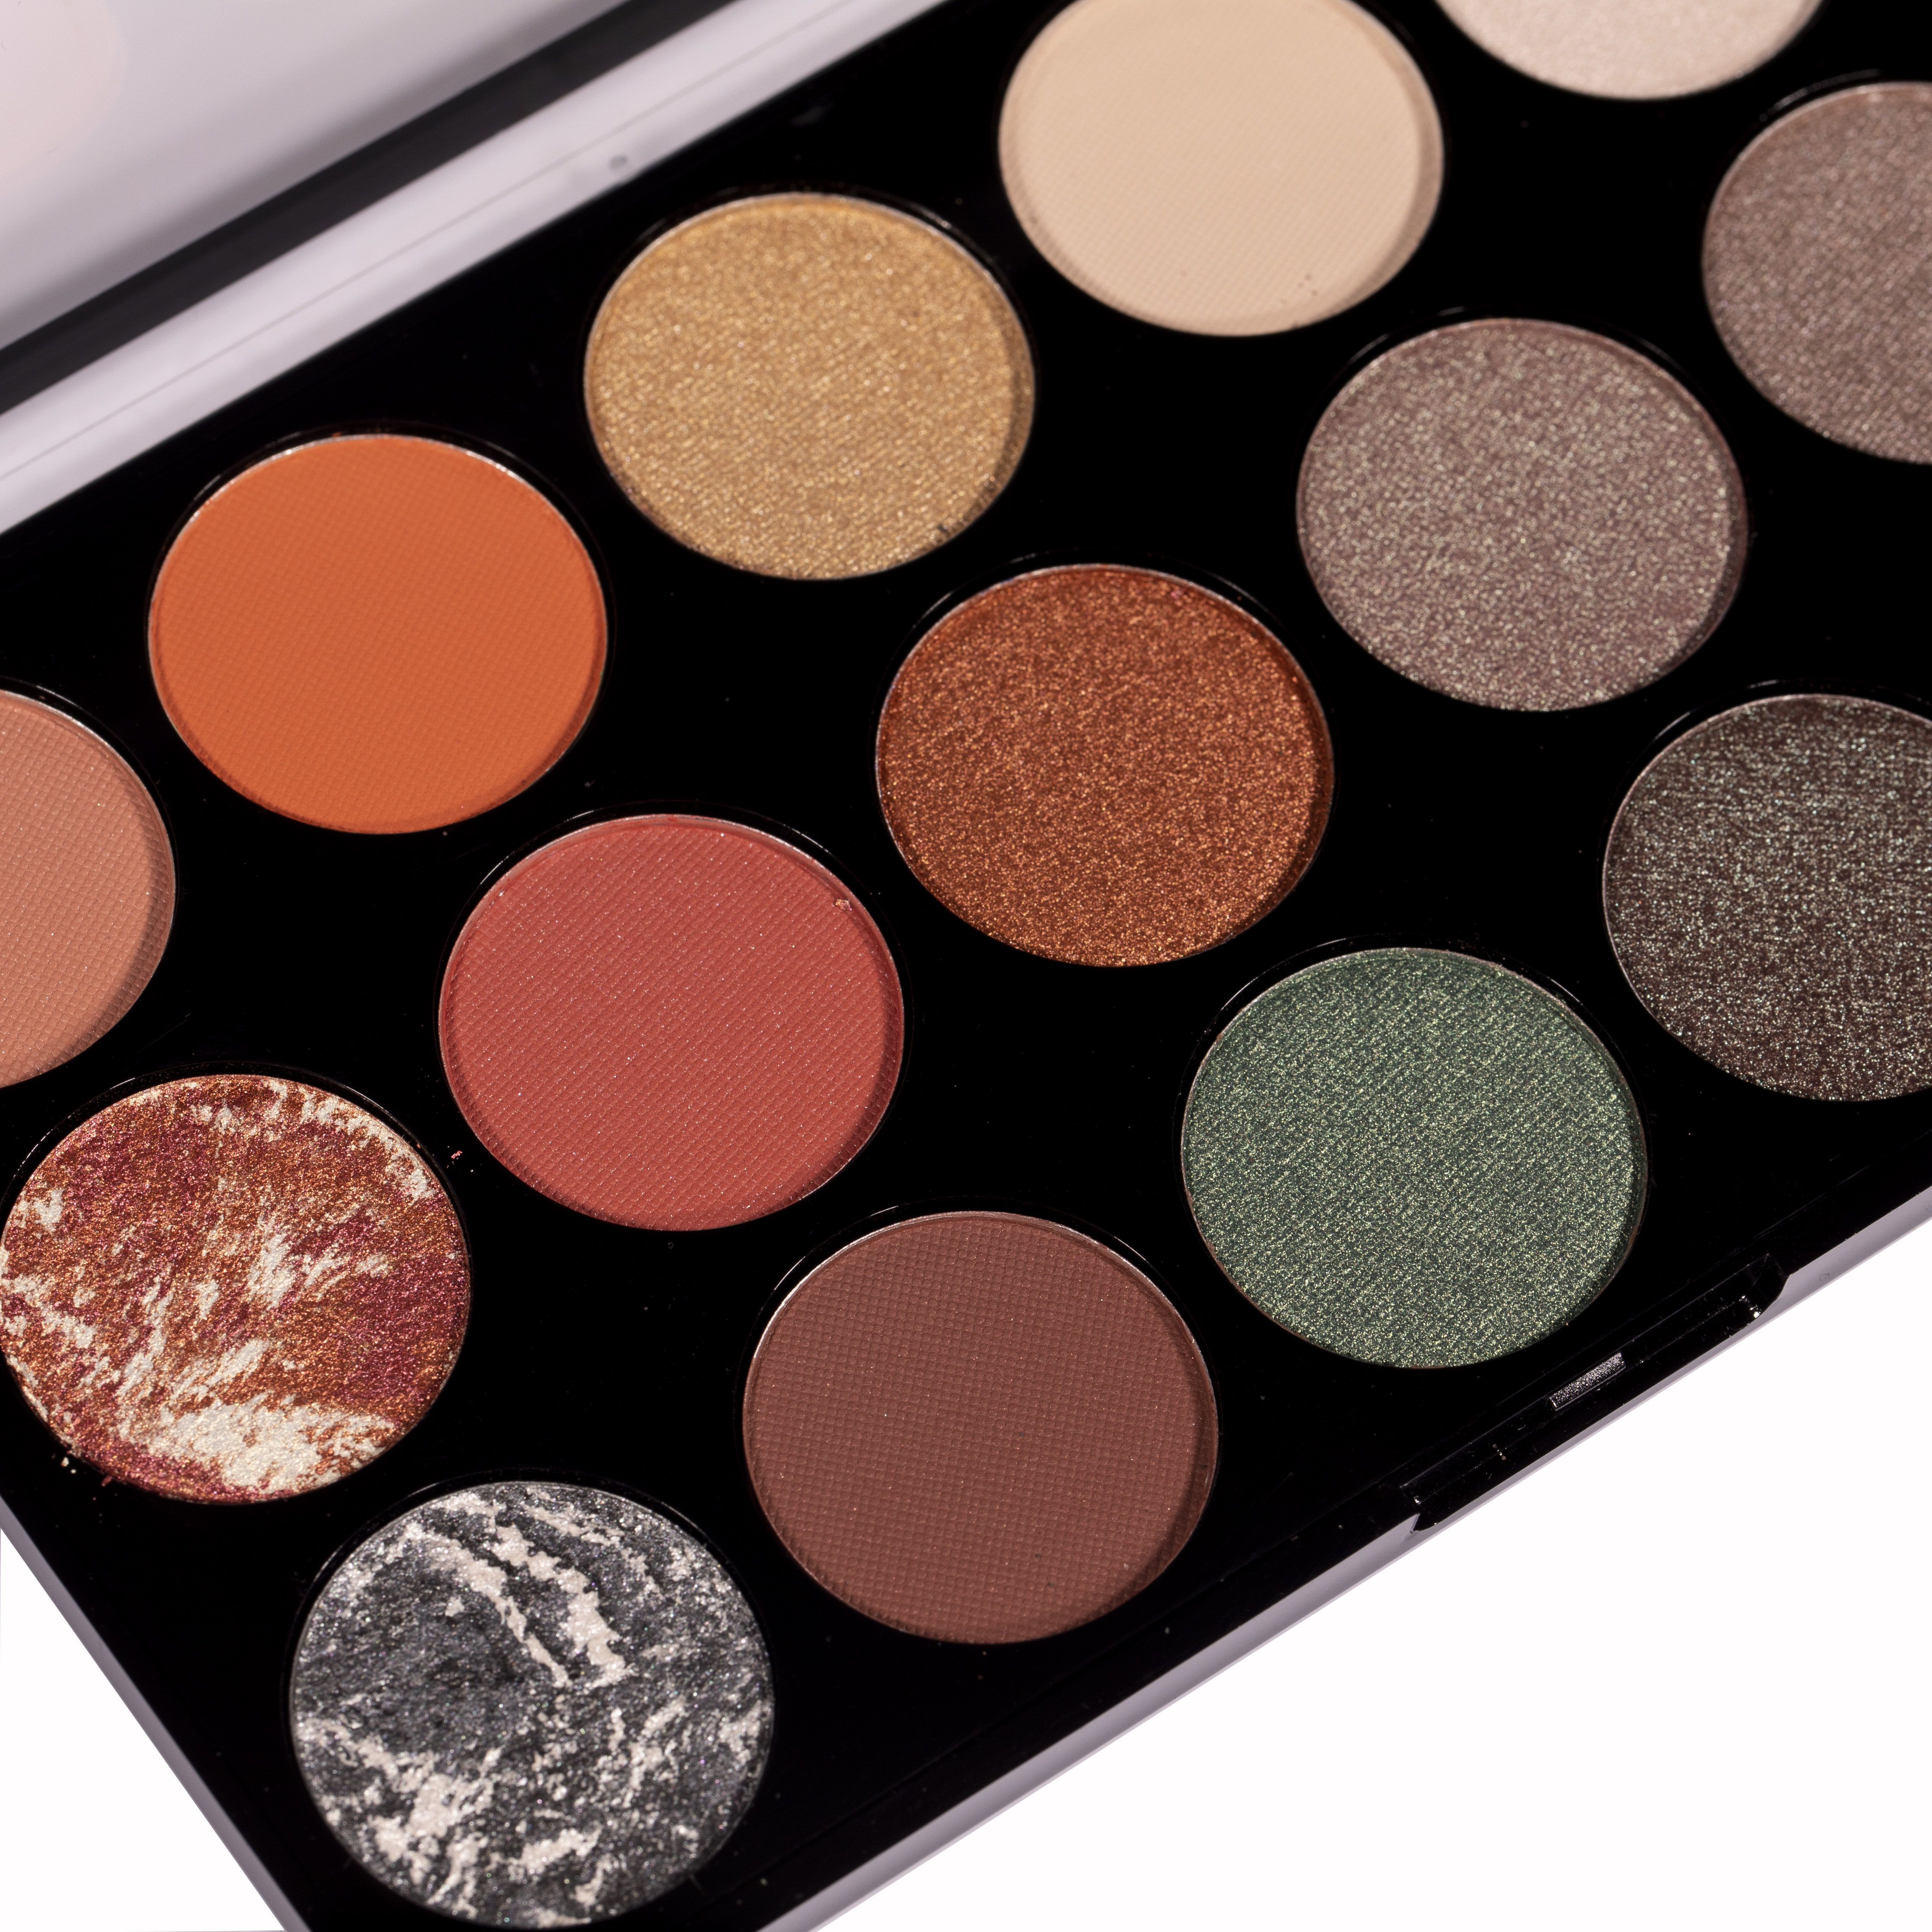 23+ Red Glitter Eyeshadow Makeup Pics